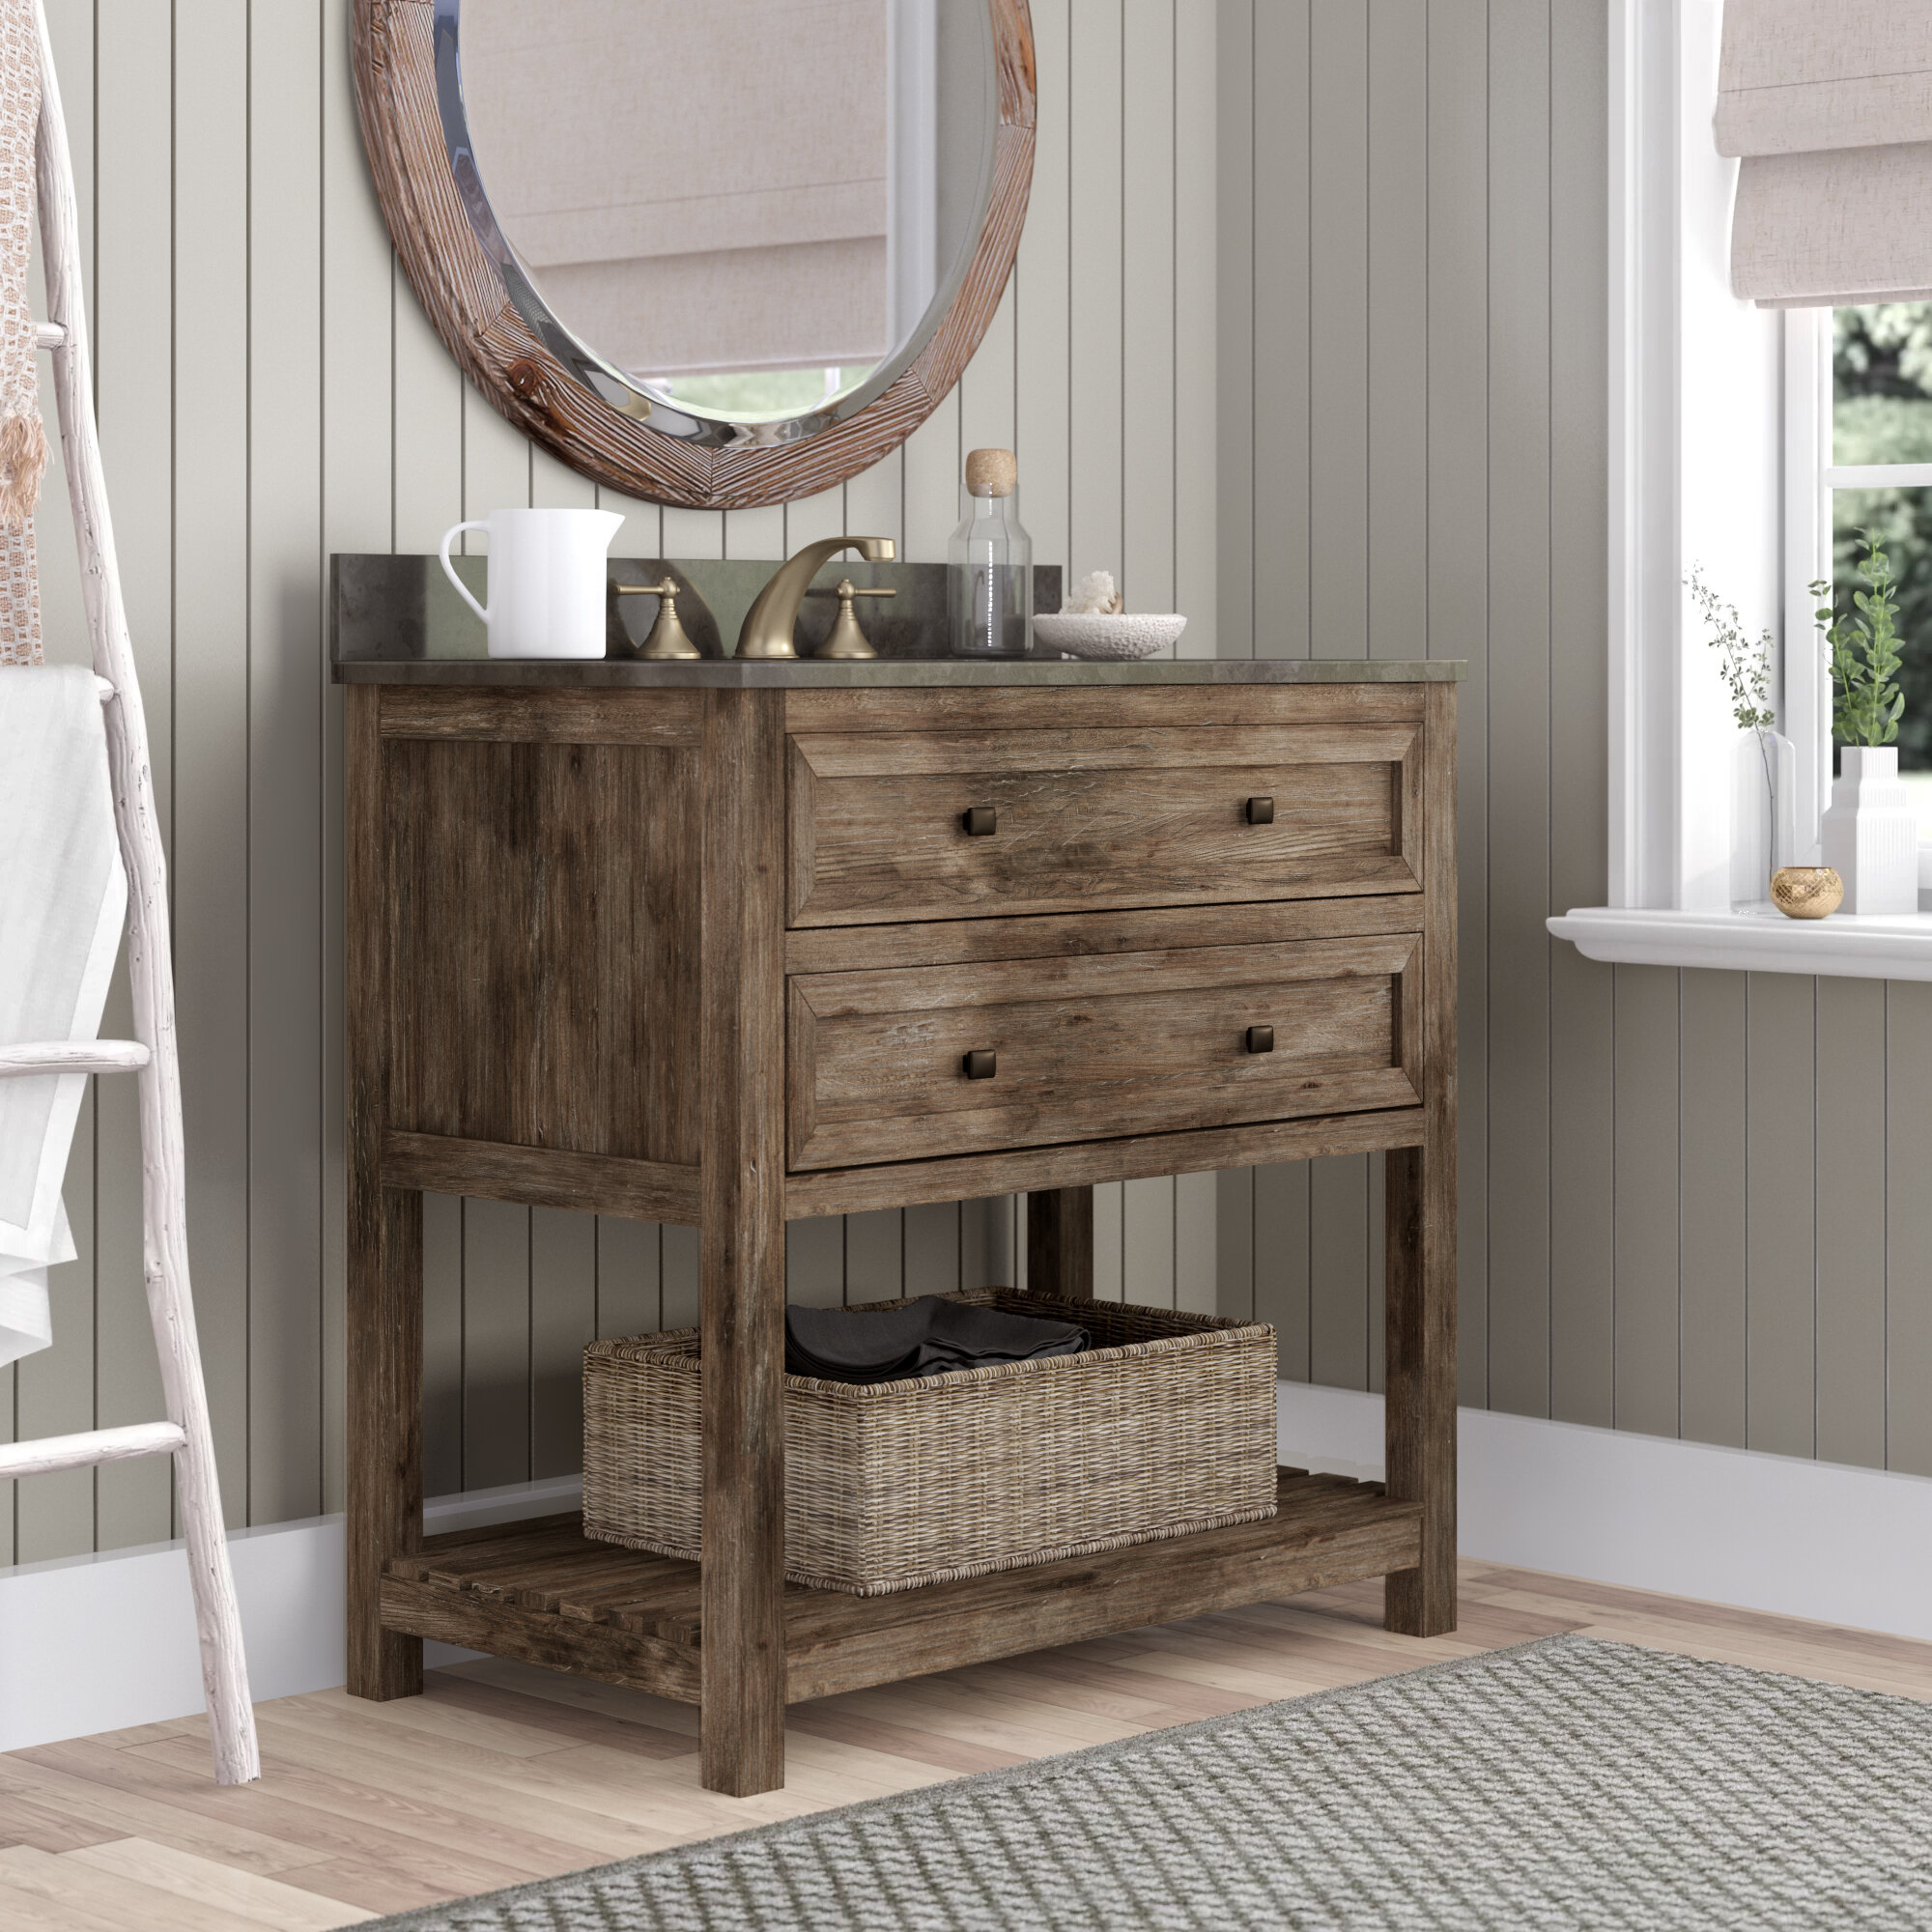 Laurel Foundry Modern Farmhouse Rosalinda 36 Single Bathroom Vanity Set Reviews Wayfair